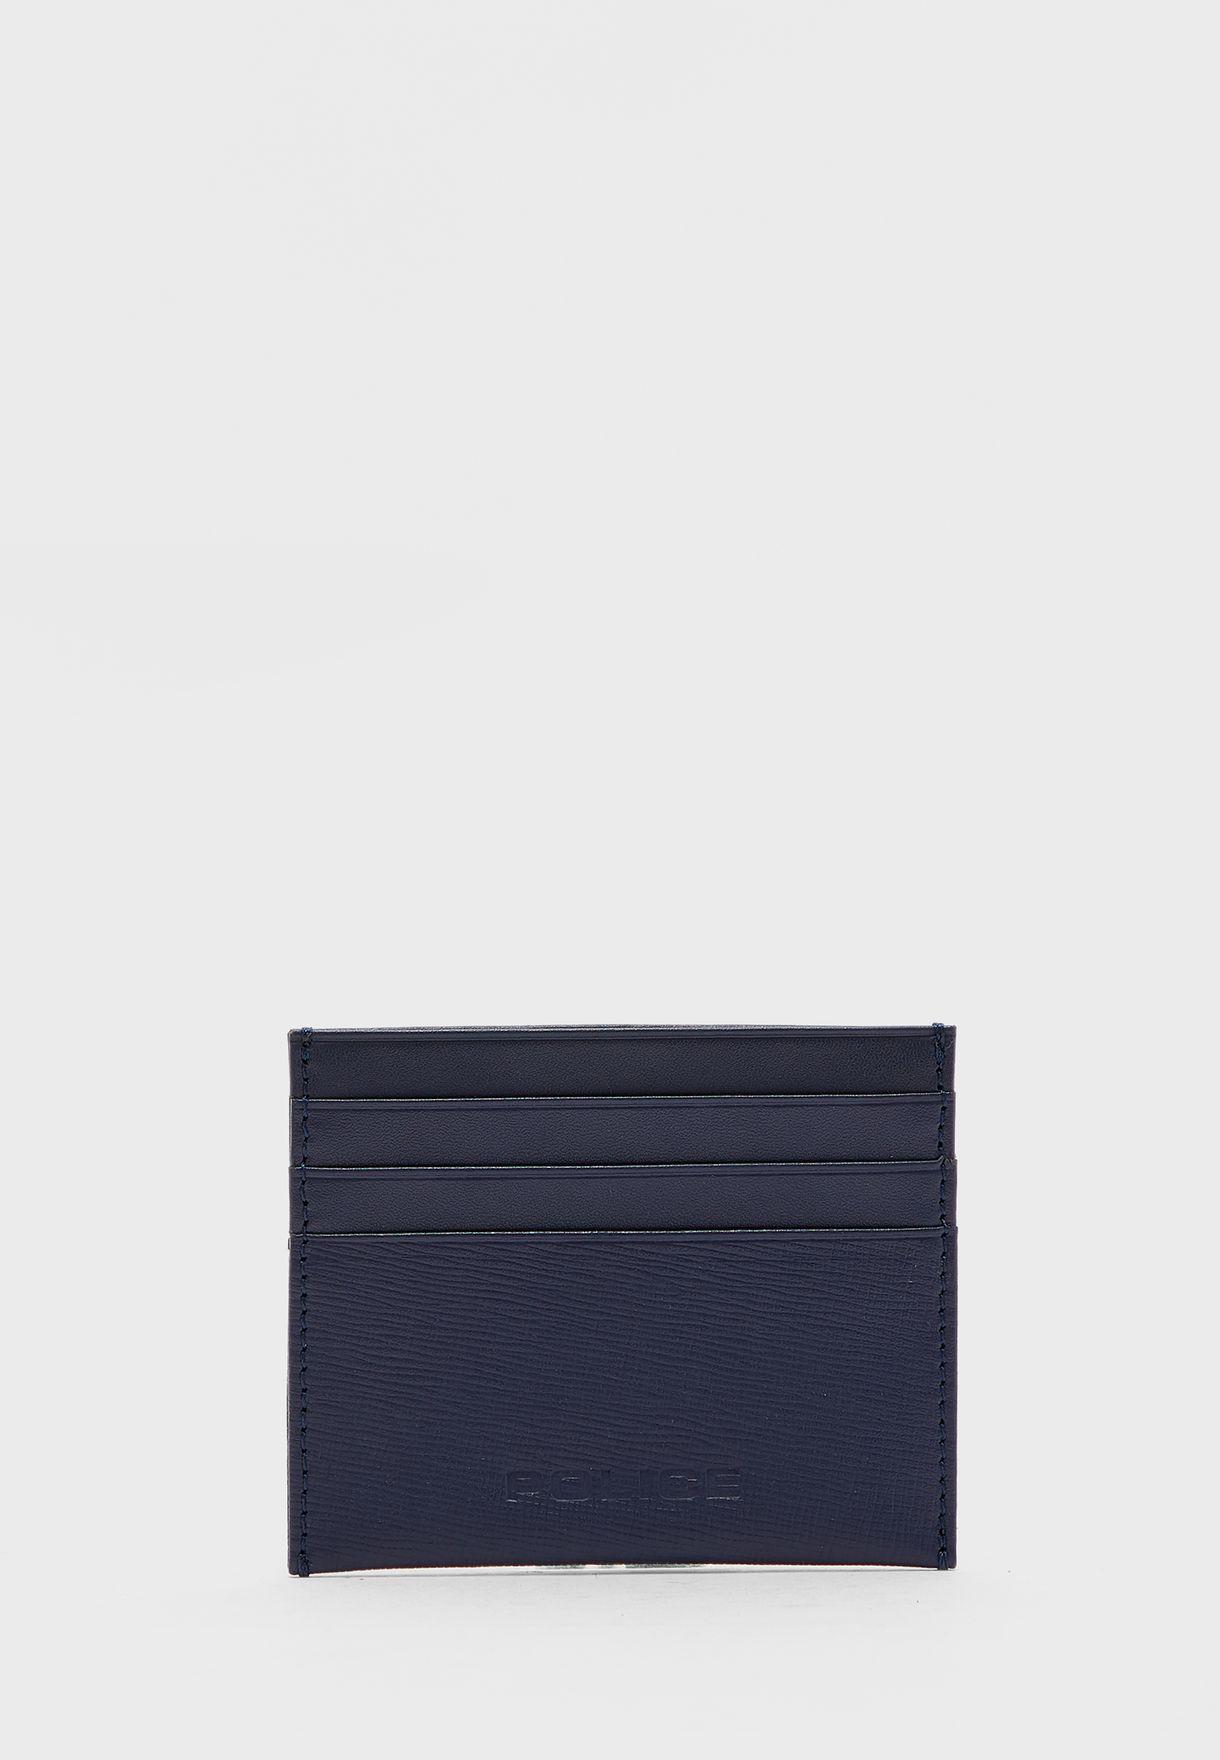 PA40049WLBL Crosshatch Cardholder